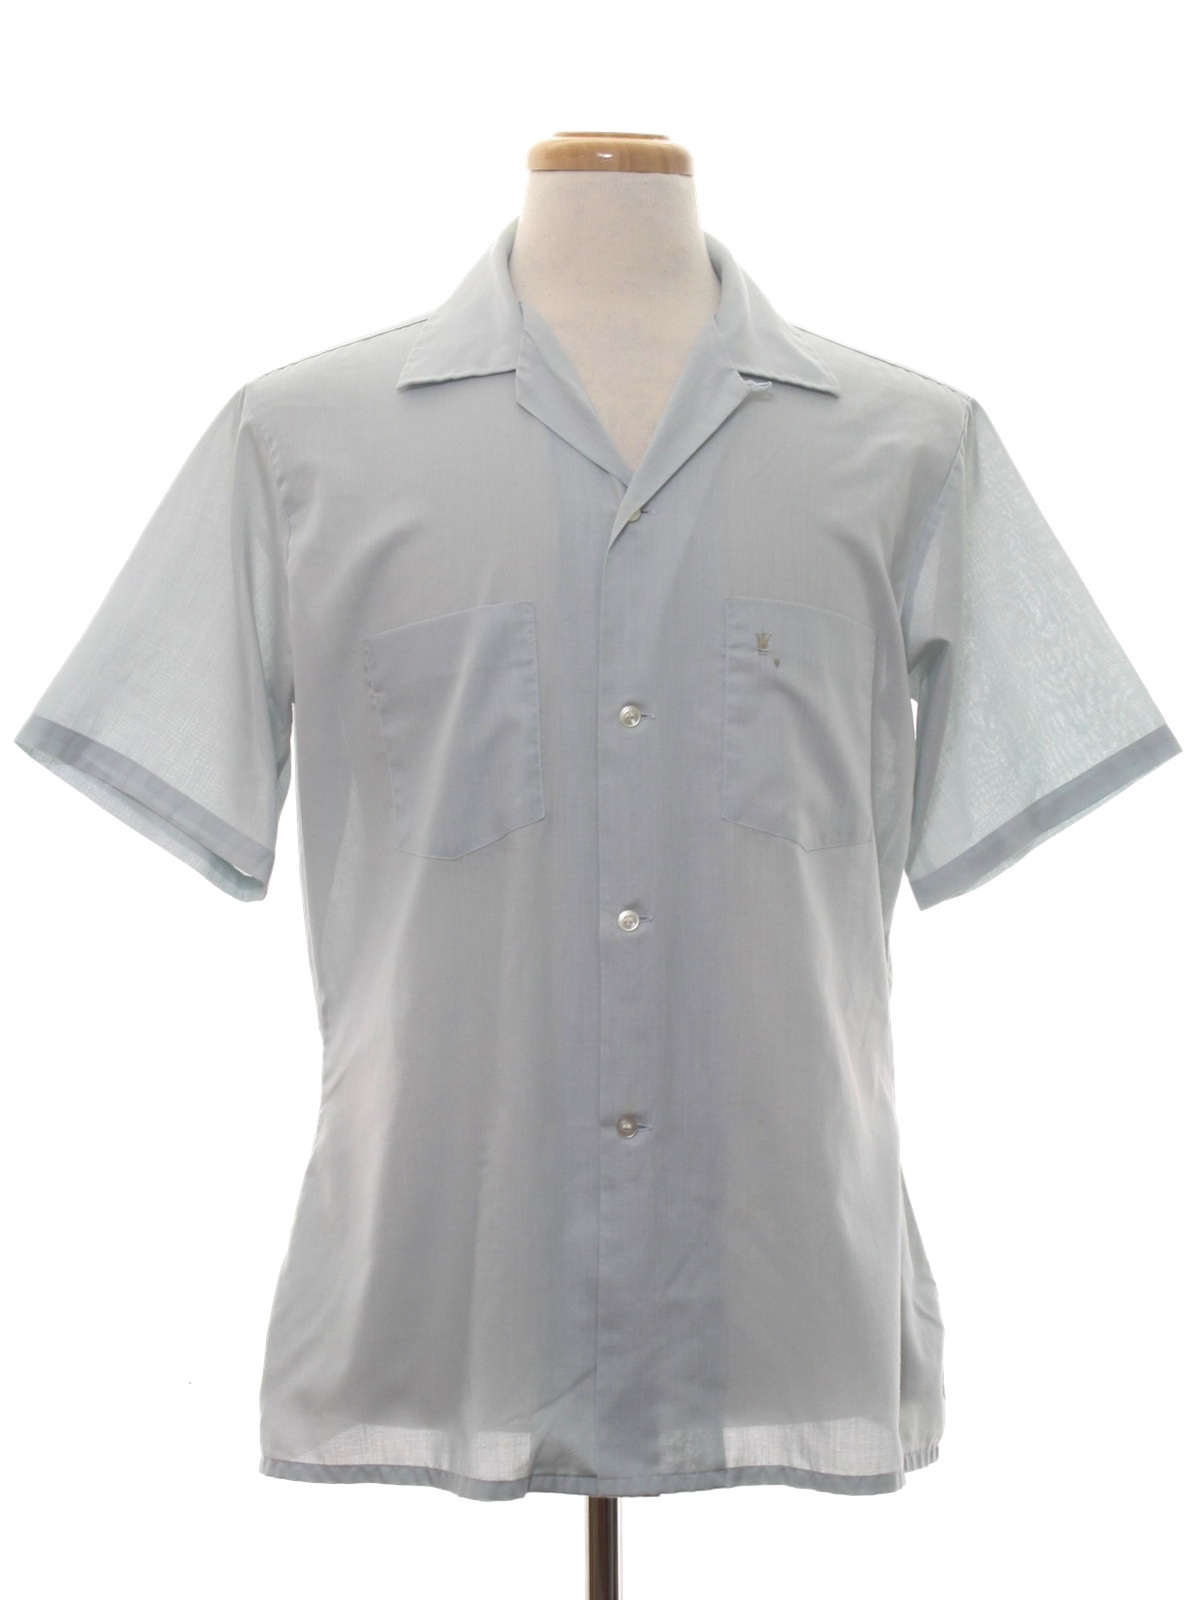 Arrow sixties vintage shirt late 60s arrow mens pale for Sports shirts near me